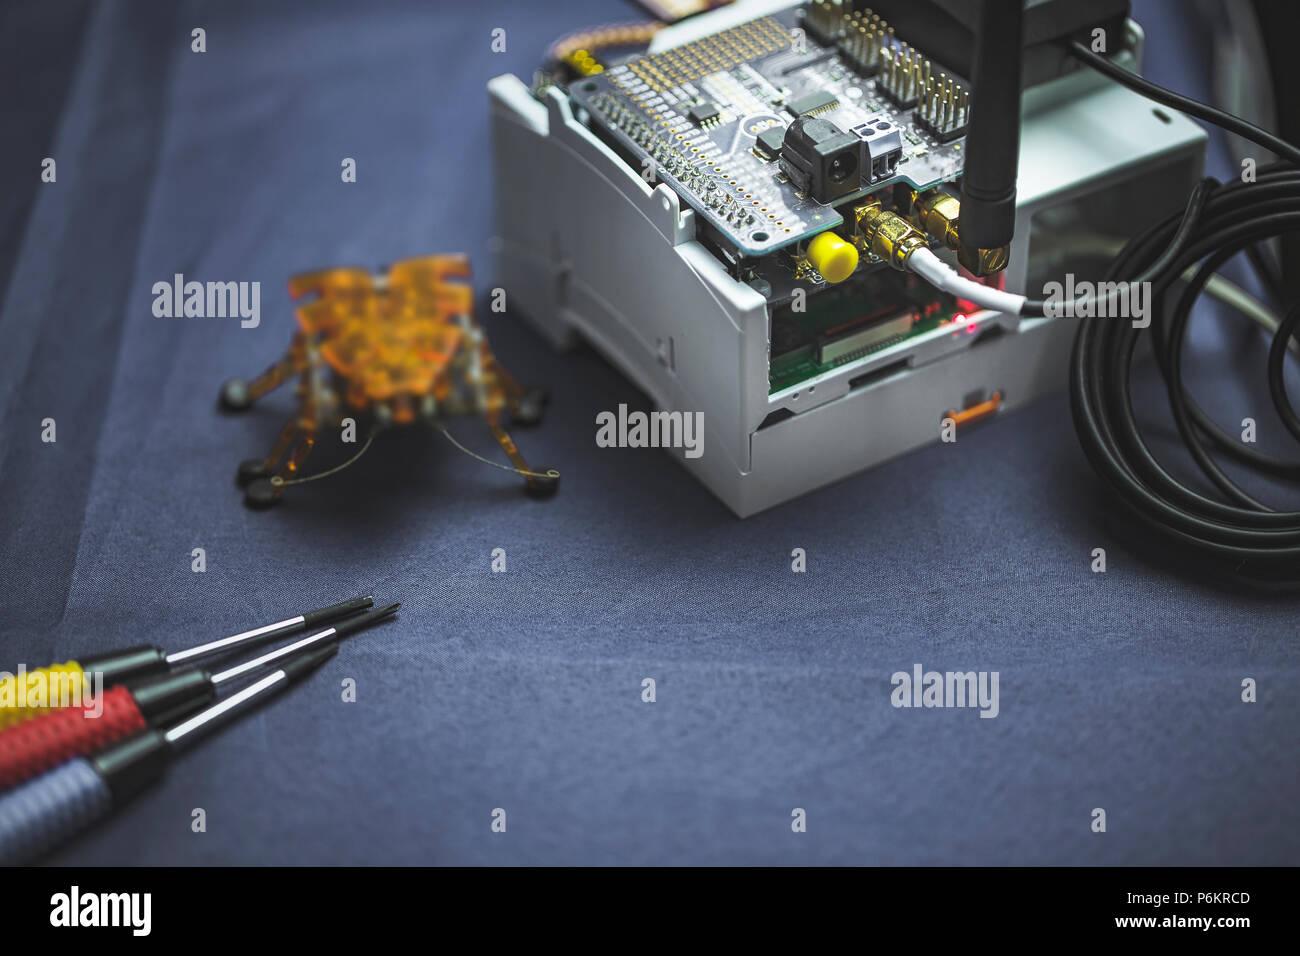 Internet of thing (IoT) Electronics Hardware and software development kit. - Stock Image